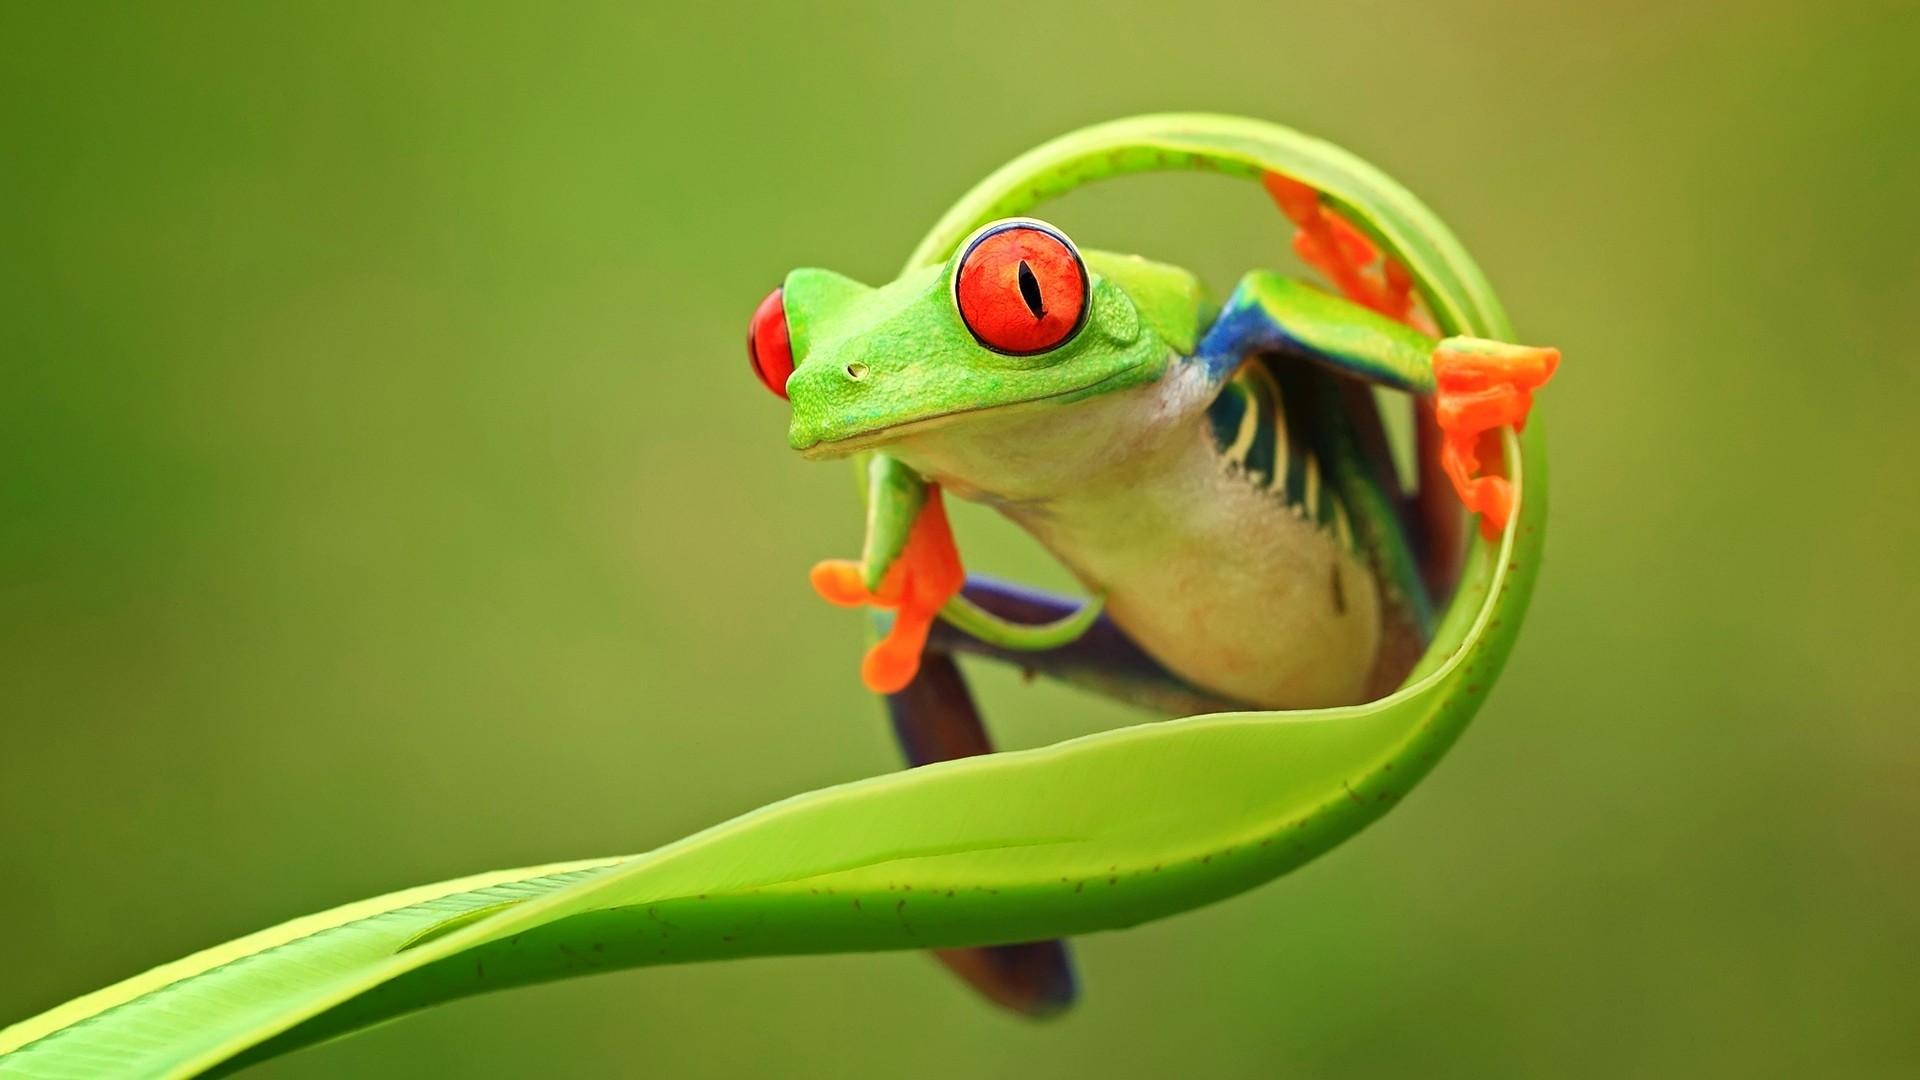 Frog hd wallpaper download